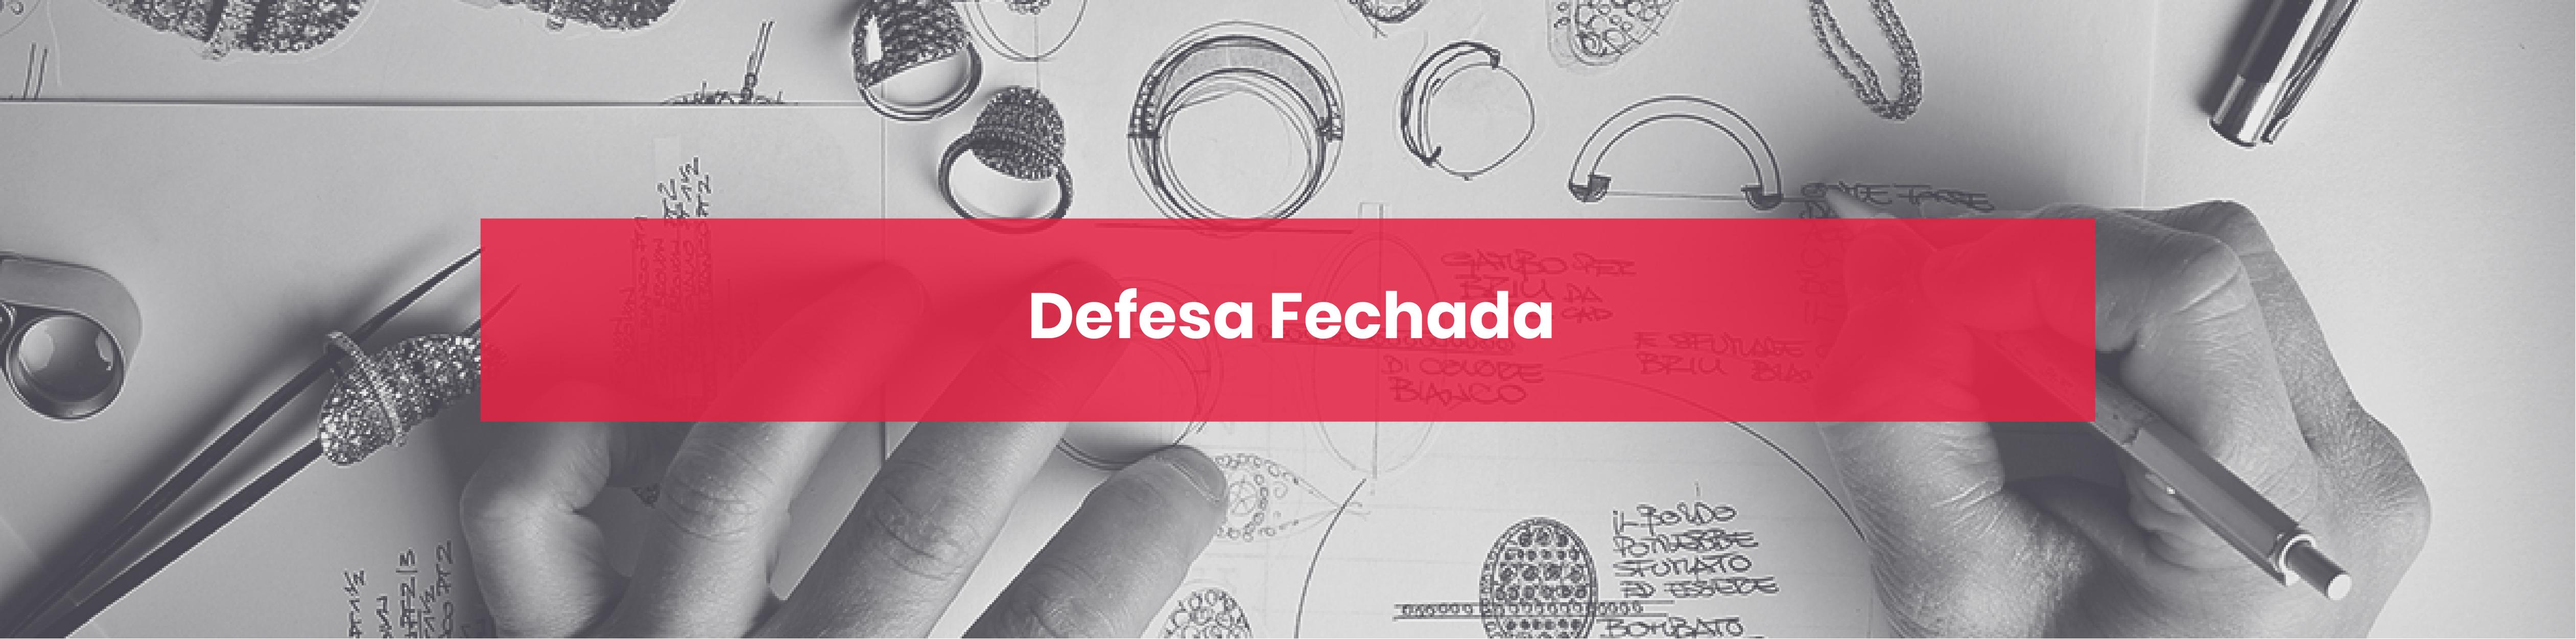 Defesa Fechada